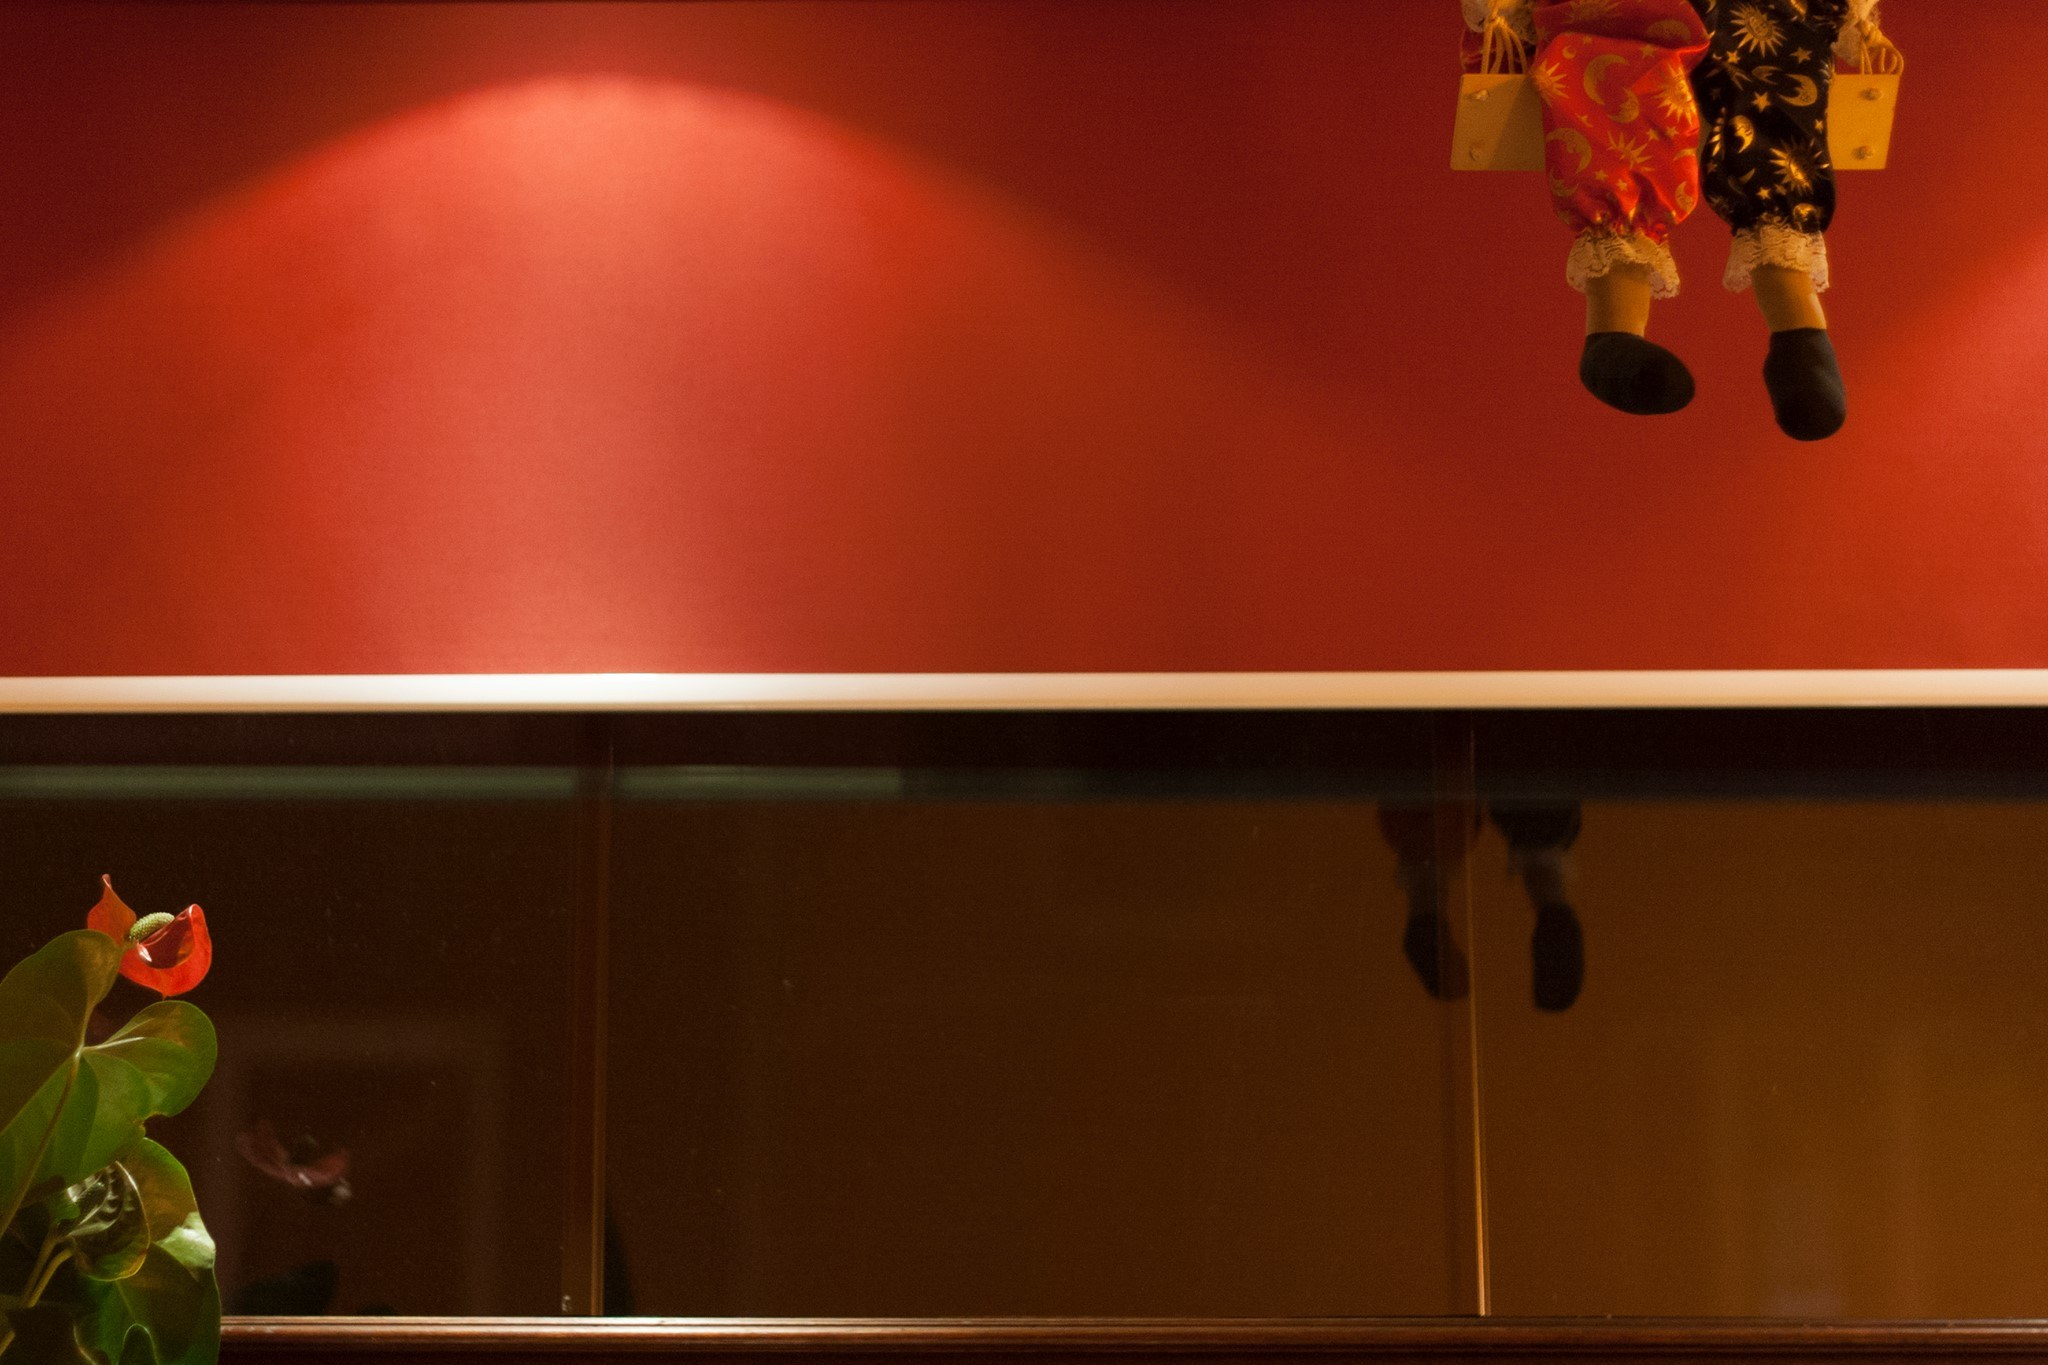 fotolabor 2 kulturzentrum nrw forum d sseldorf. Black Bedroom Furniture Sets. Home Design Ideas